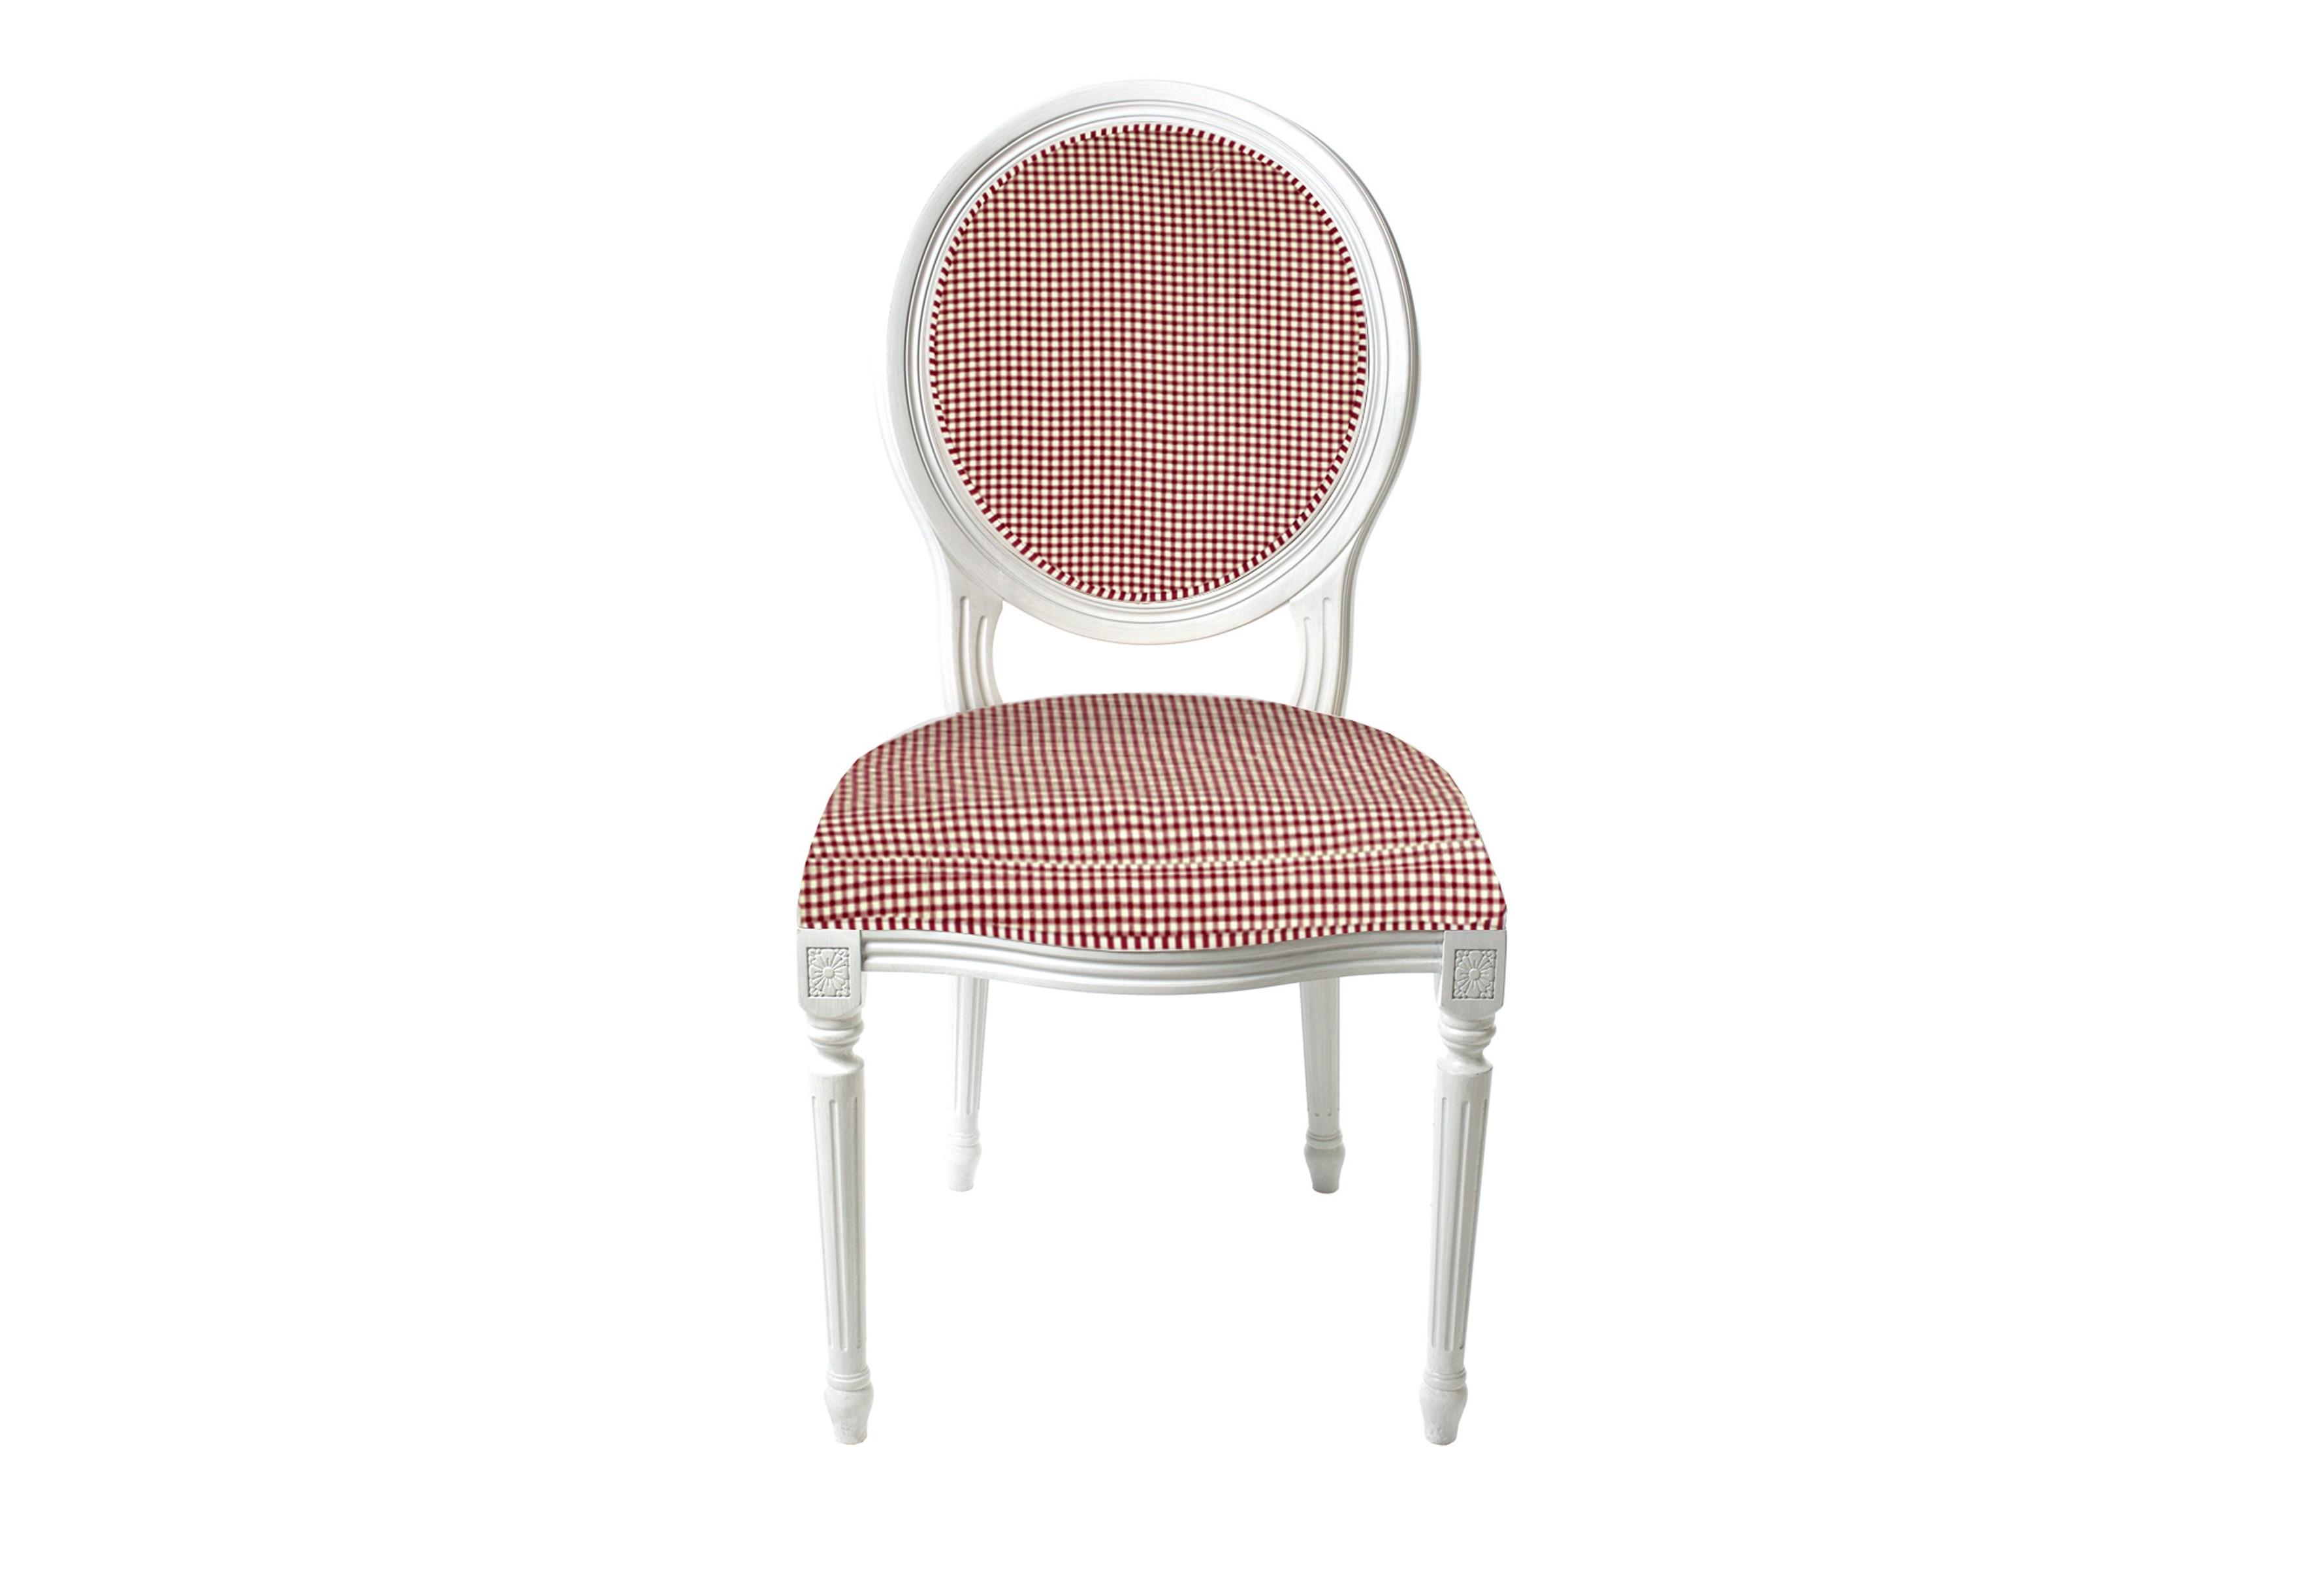 Кухонный стул La Neige 15443684 от thefurnish